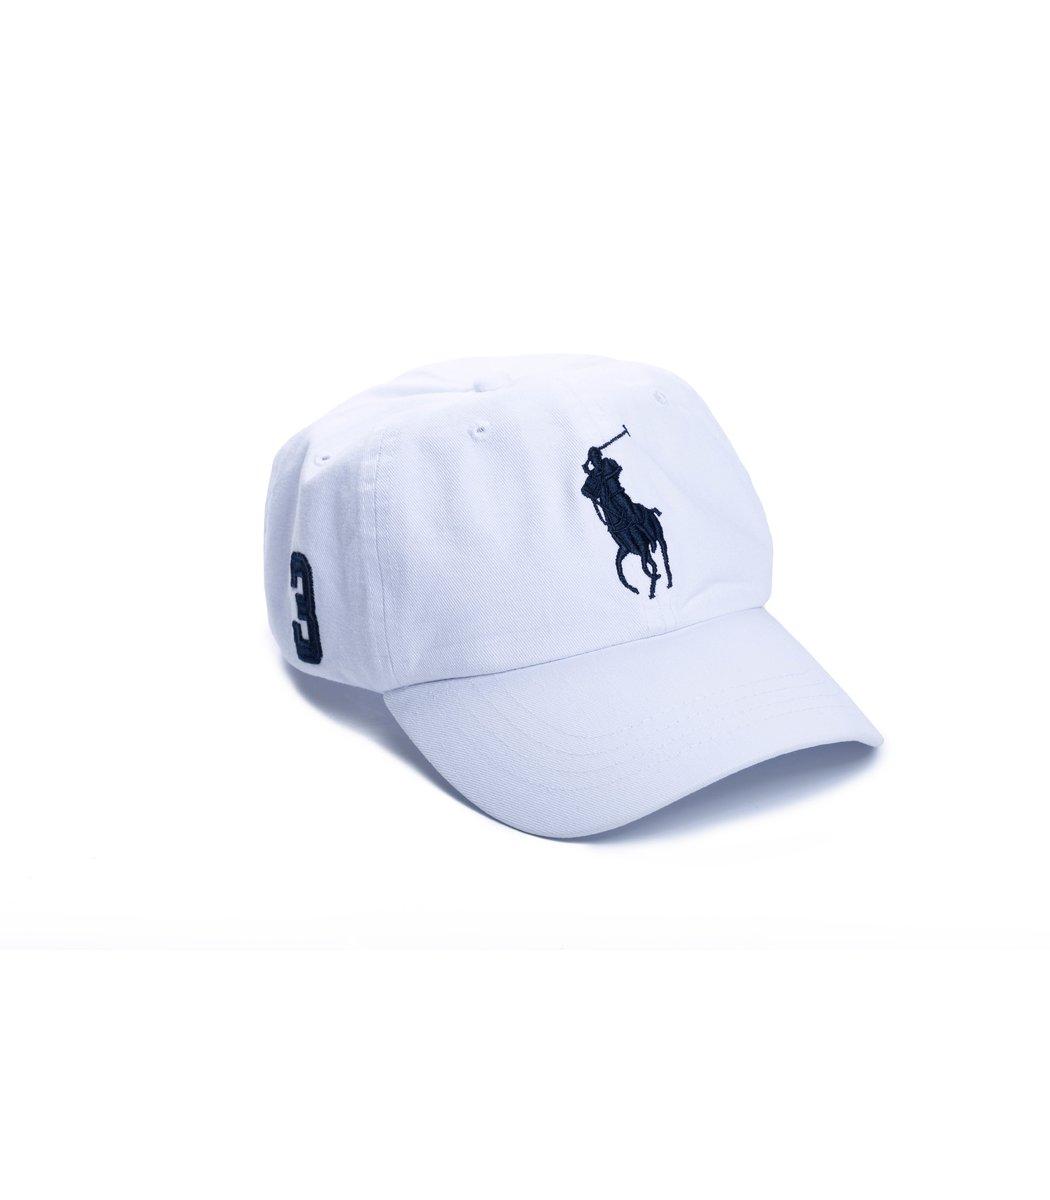 Кепка POLO Ralph Lauren Classic 3 Белый/синий